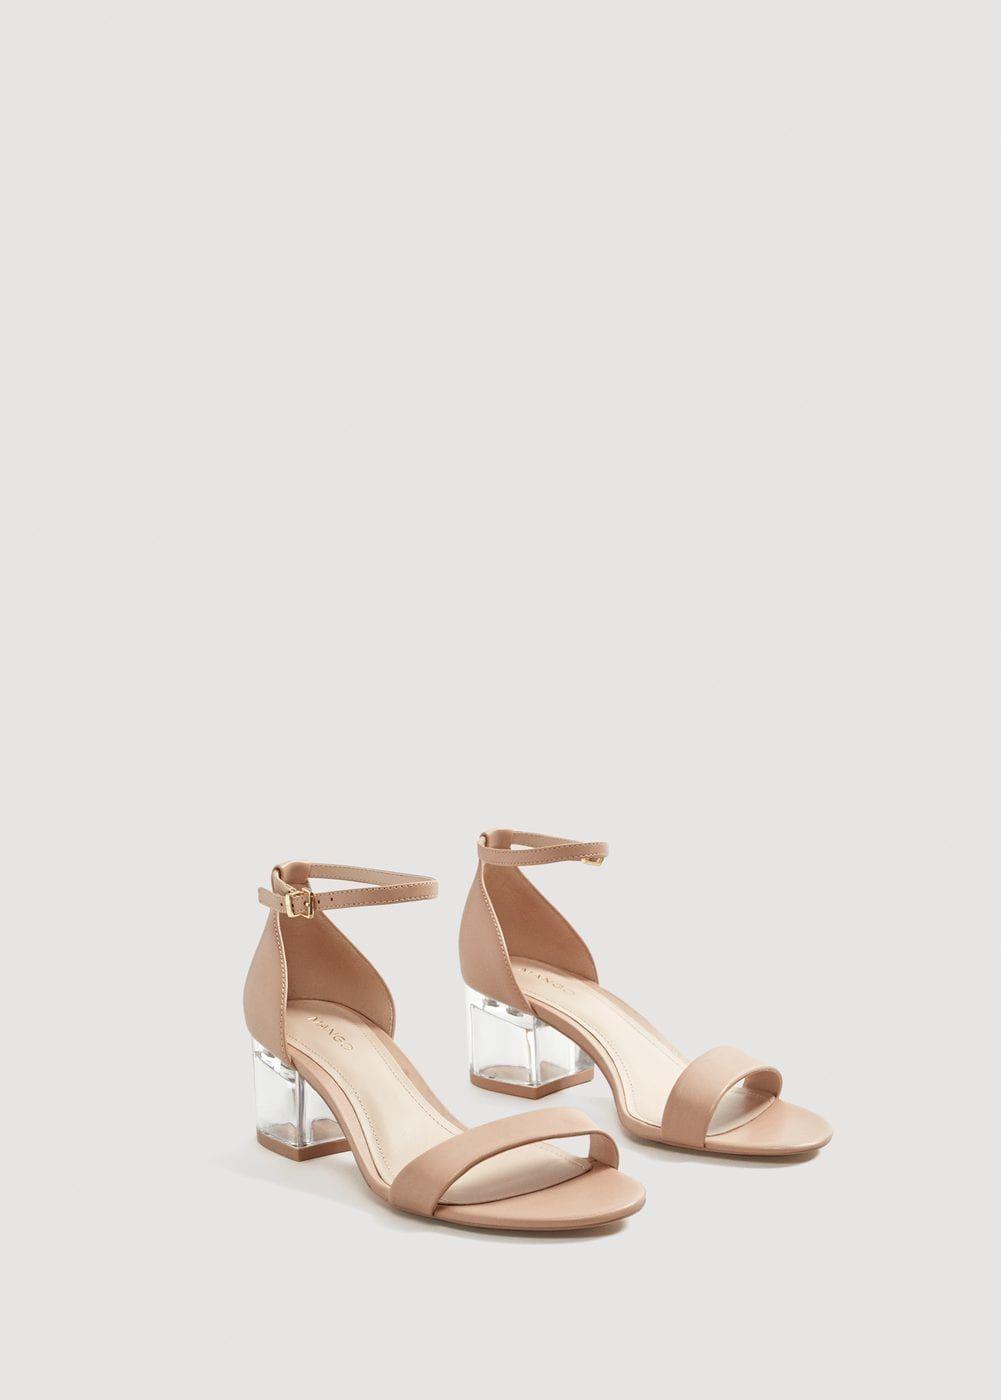 Tacón Sandalia Mujer 2019 Transparente Heels En See Fashion 6qqwzndC